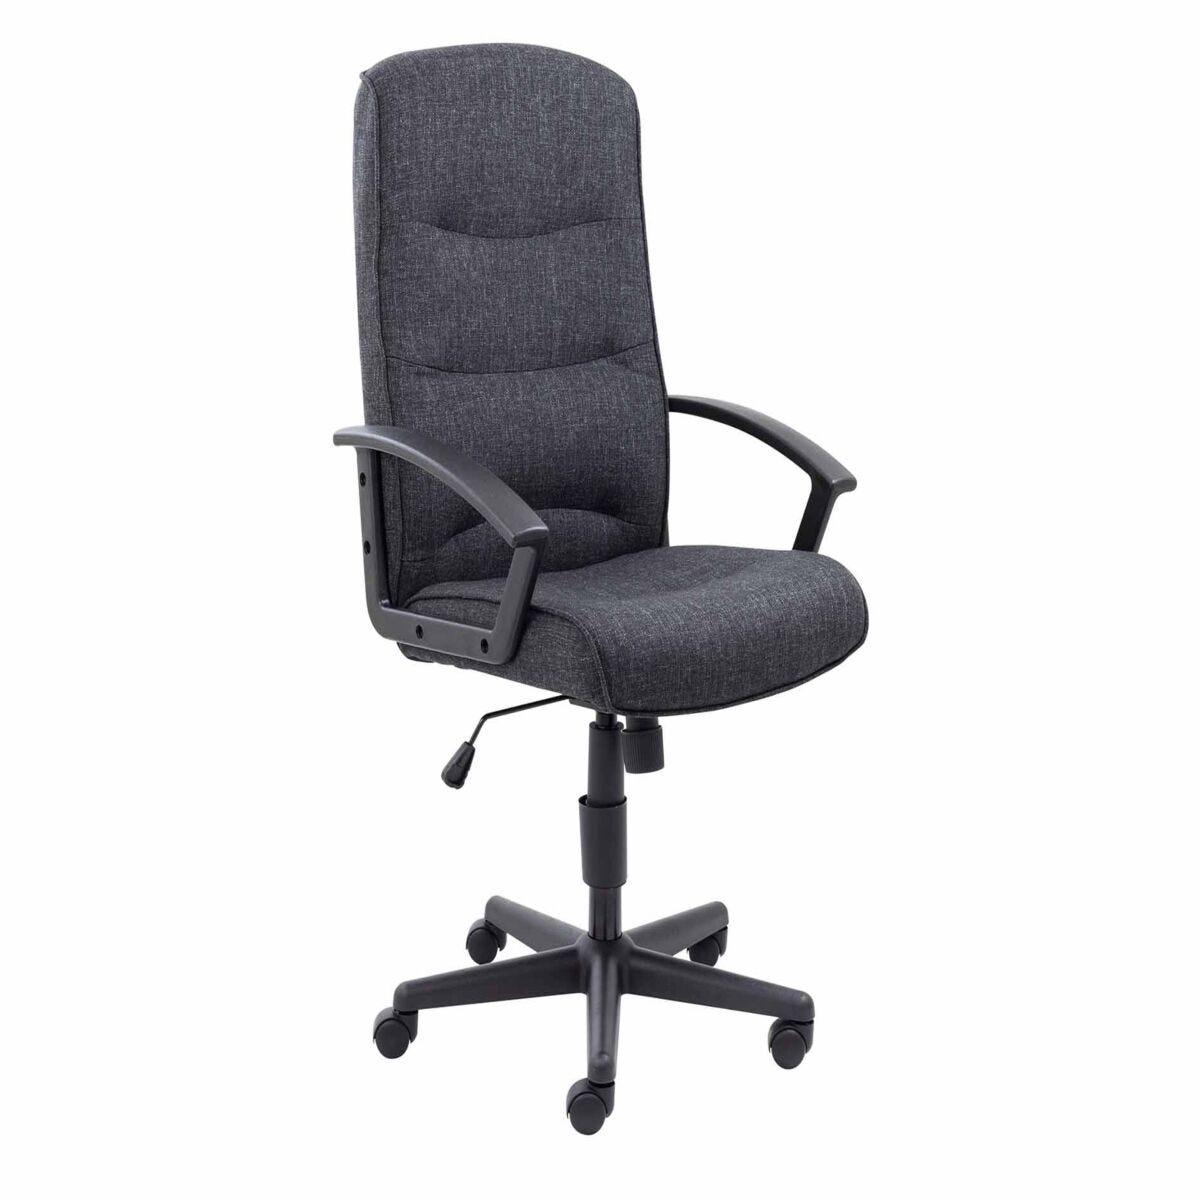 TC Office Canasta 2 Fabric Executive Chair